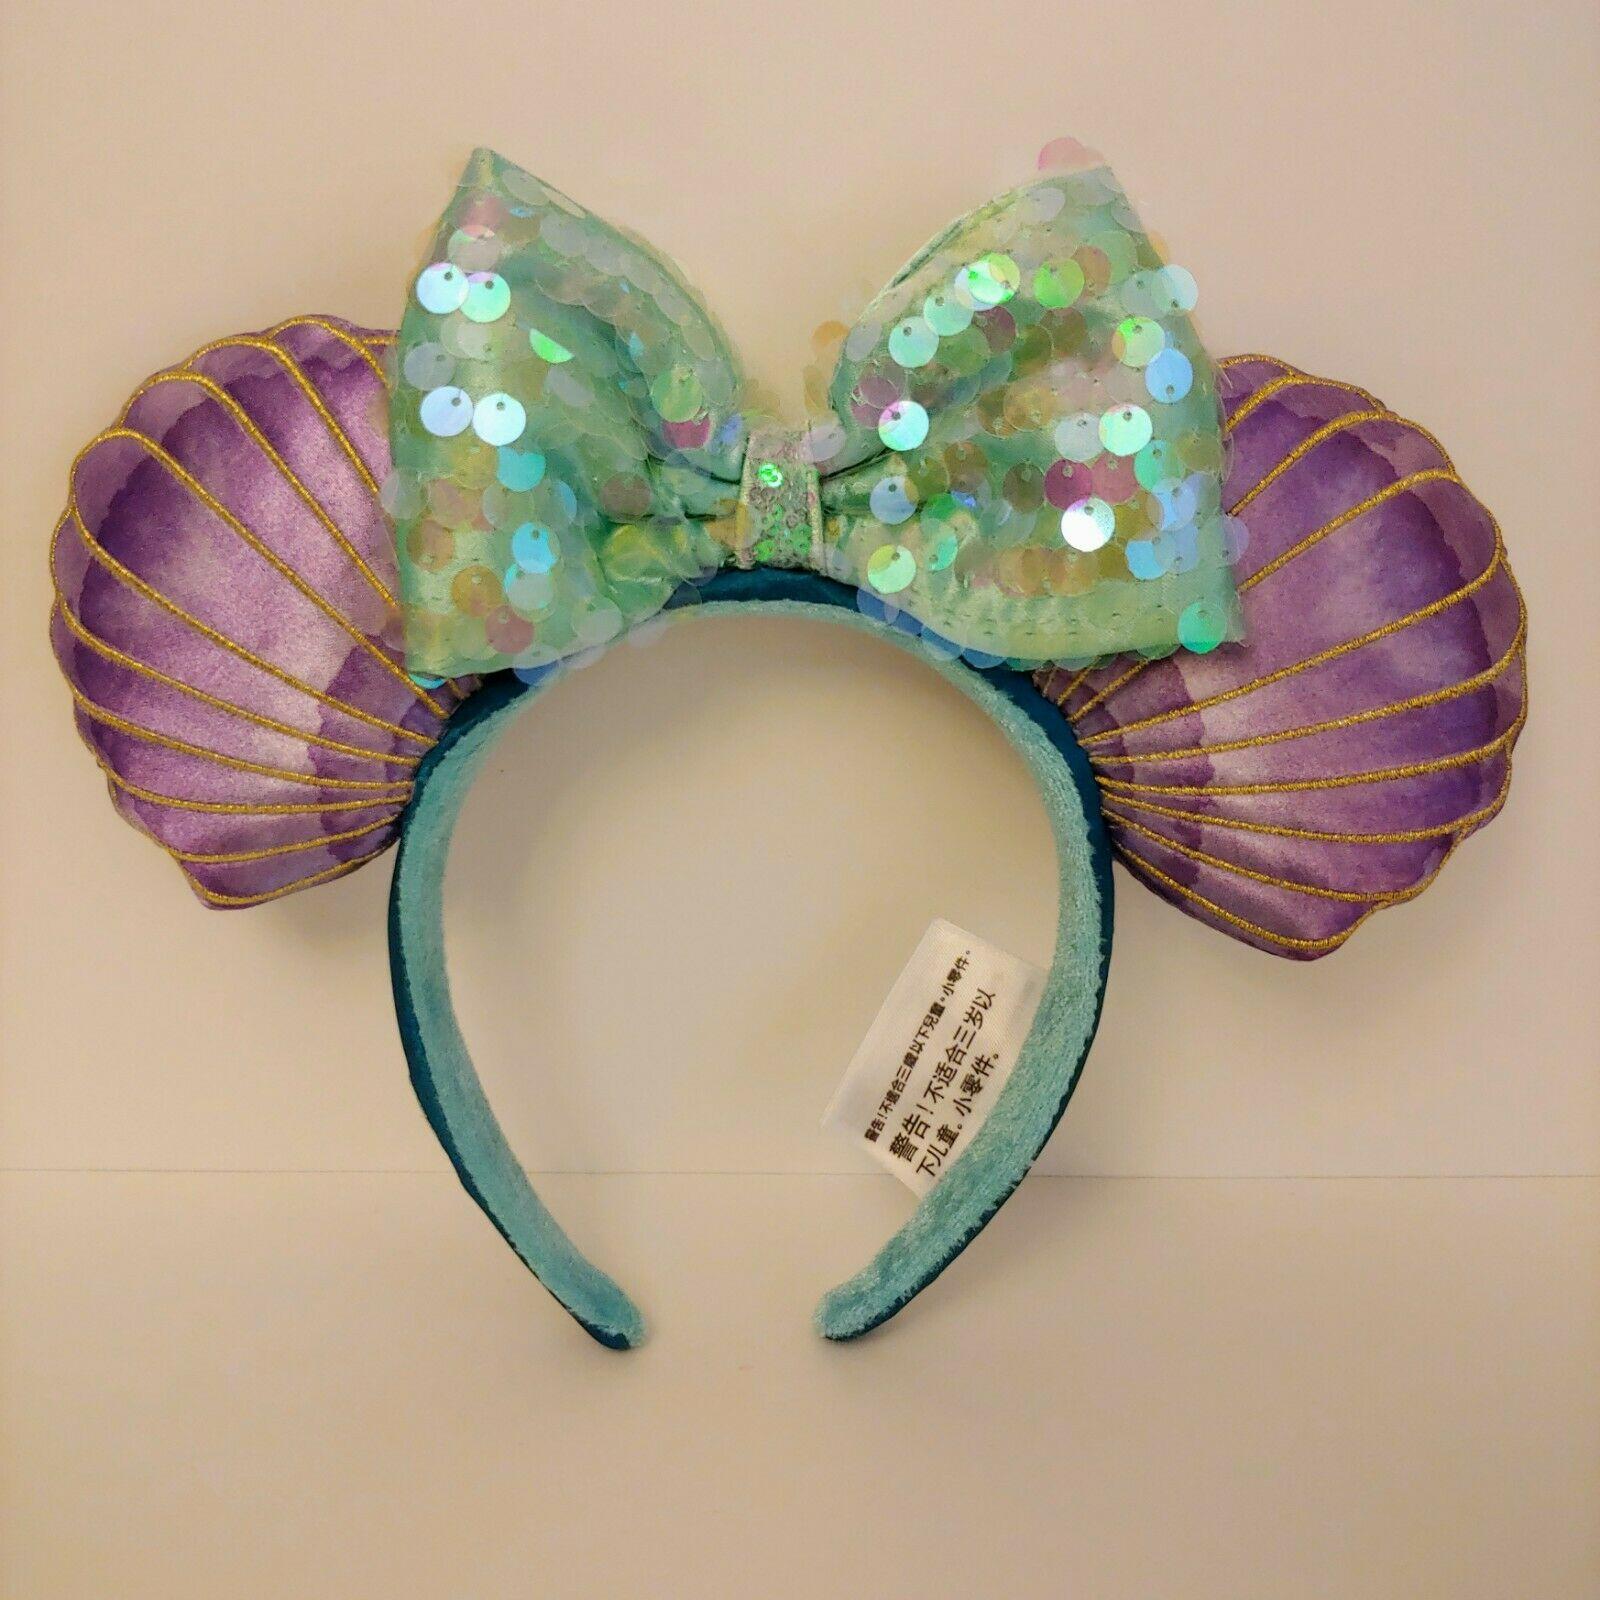 Little Mermaid Ariel Minnie Ears Headband Mermaid Hair Don't Care